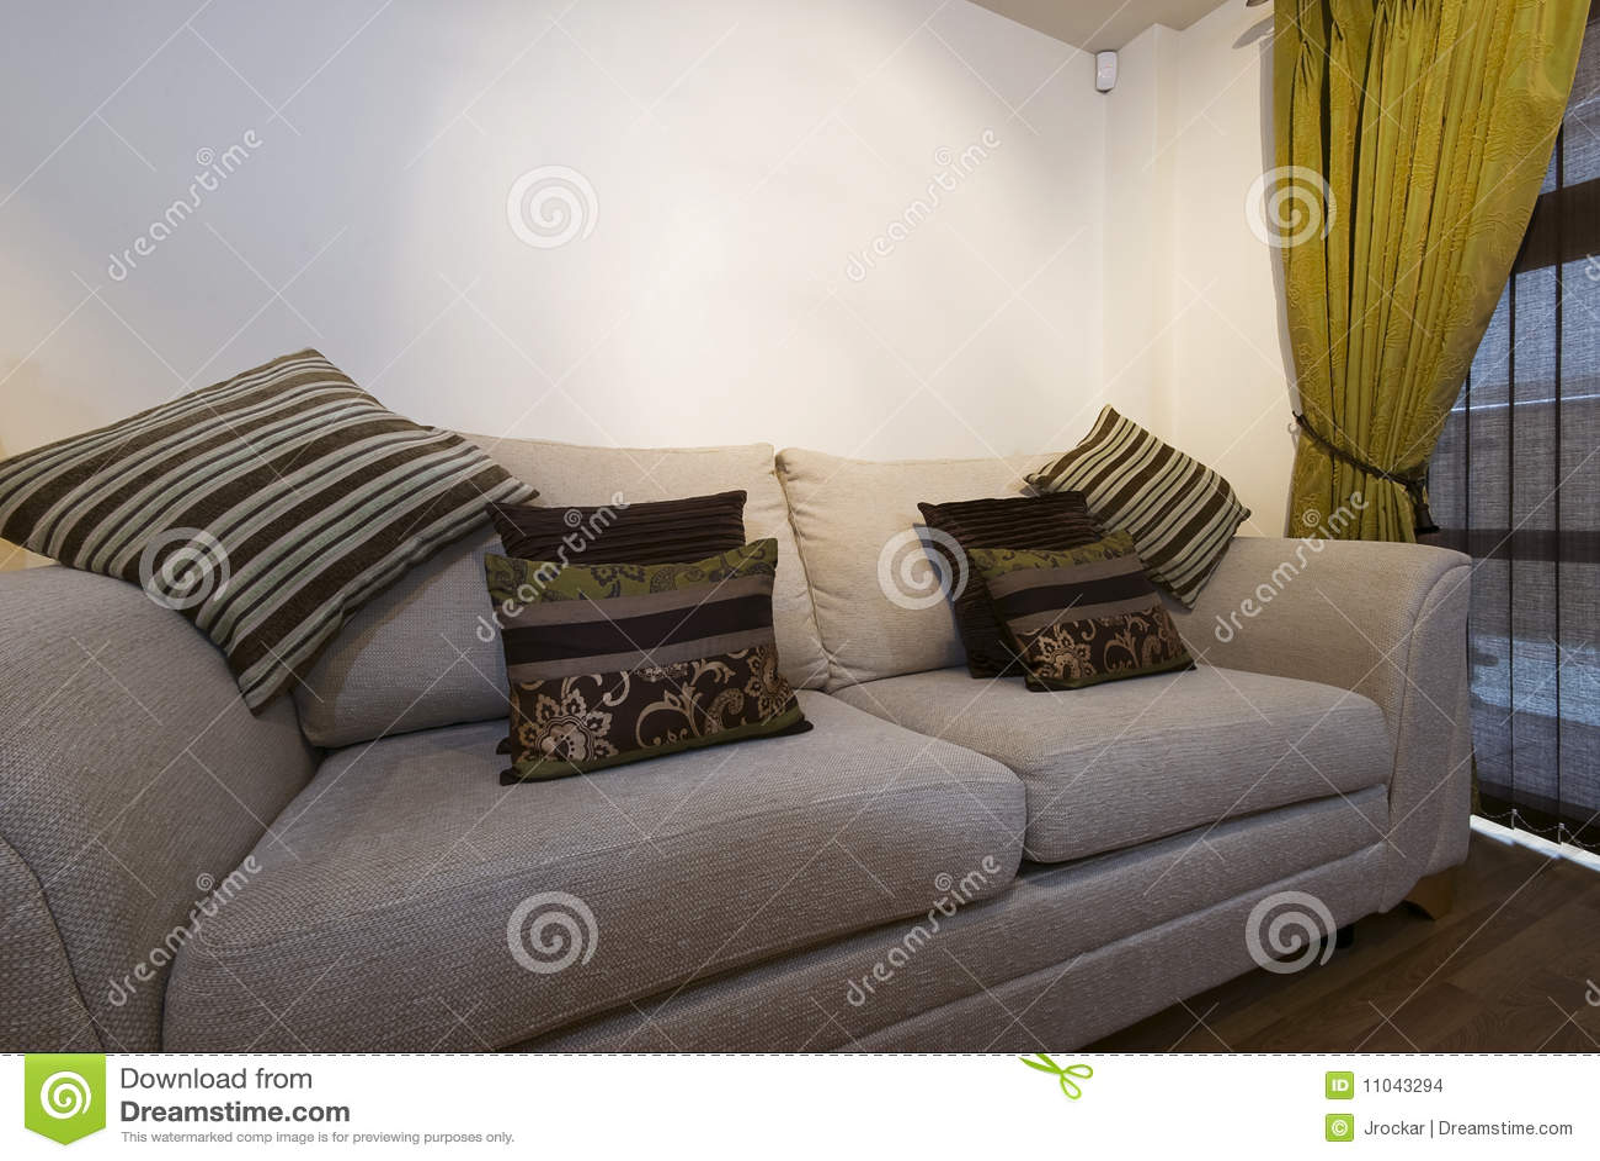 Great Comfortable Settee